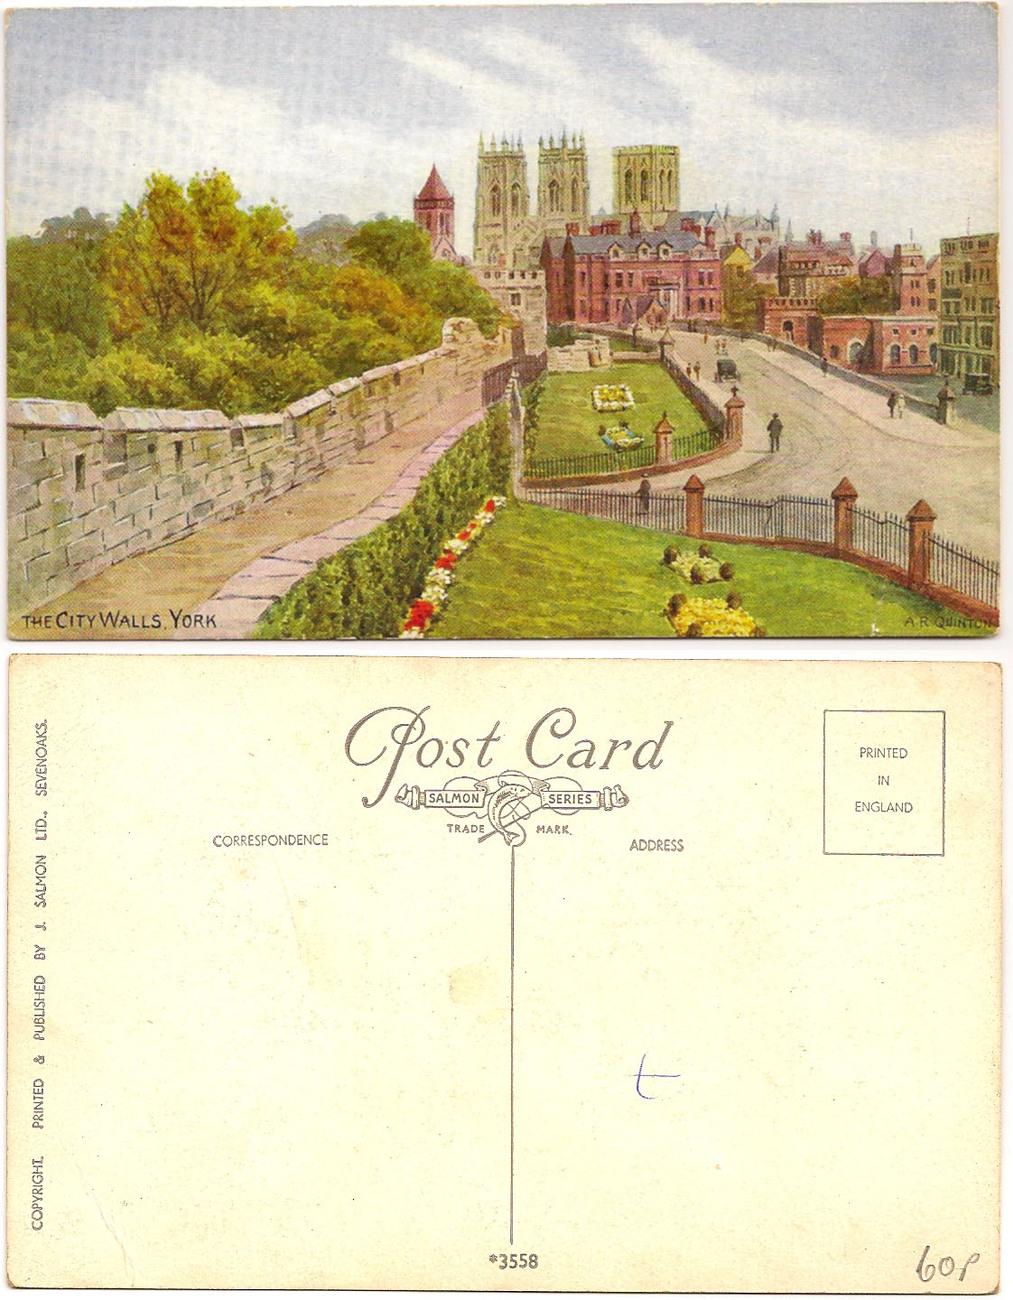 Yorkcitywalls postcard